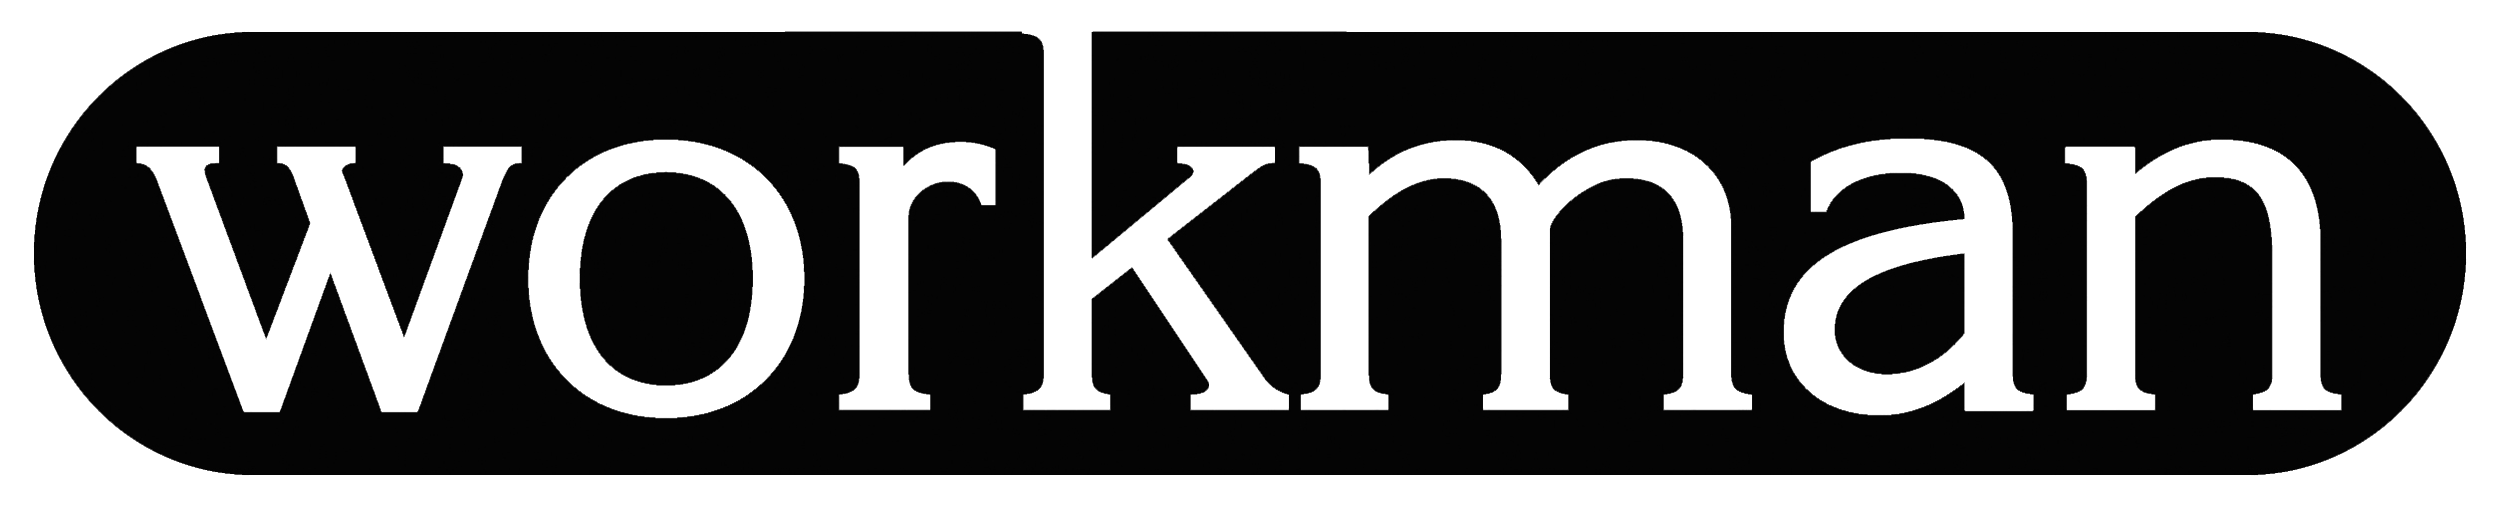 workman logo.png